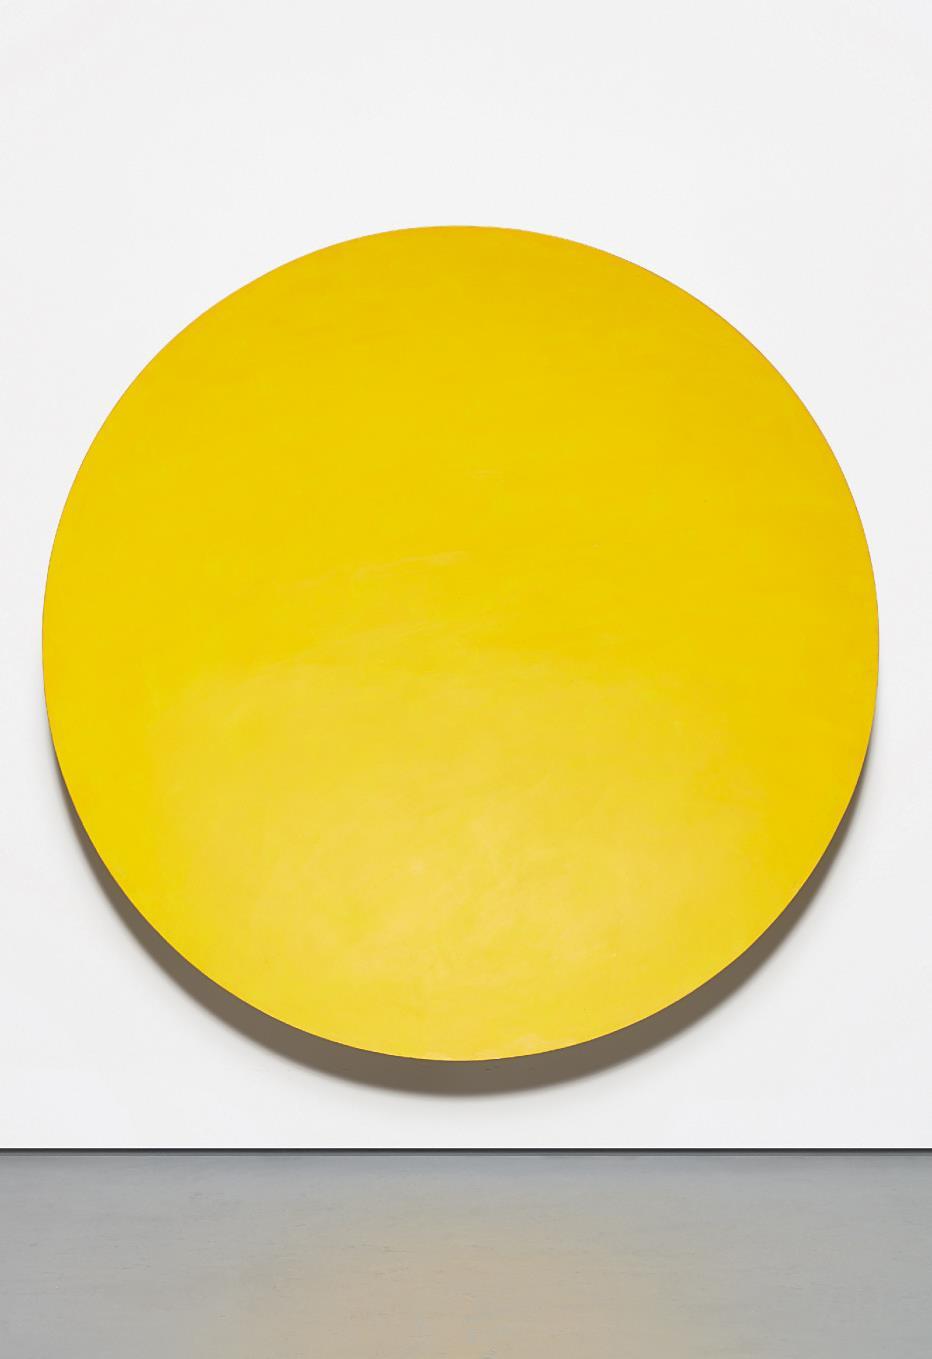 Jonathan Borofsky-The Sun At 3,214,887-1989